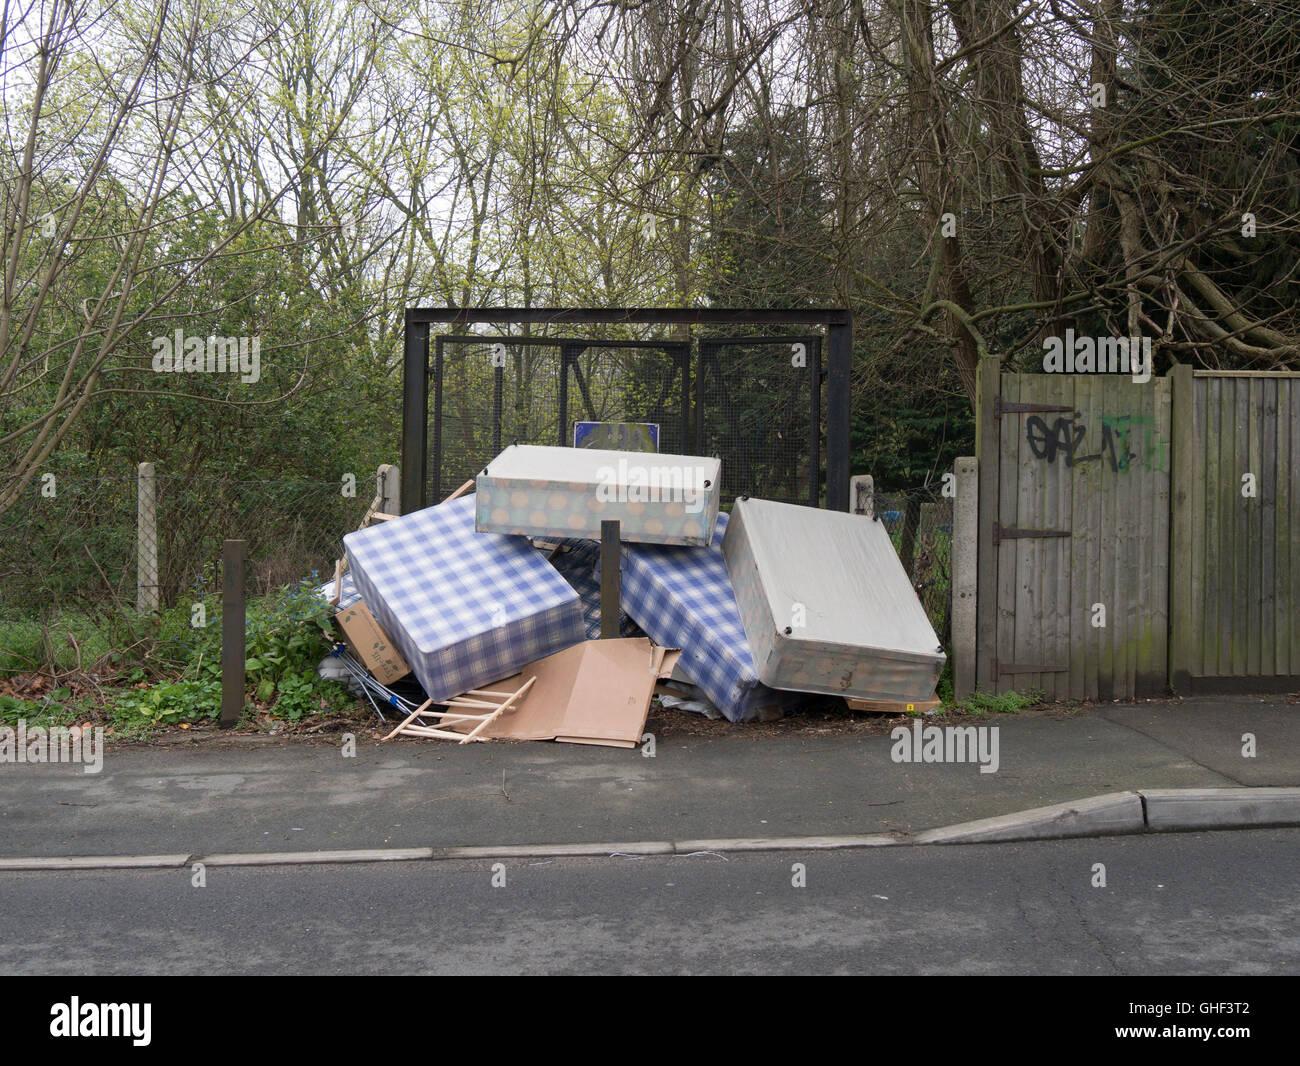 old london road kingston stockfotos old london road kingston bilder alamy. Black Bedroom Furniture Sets. Home Design Ideas